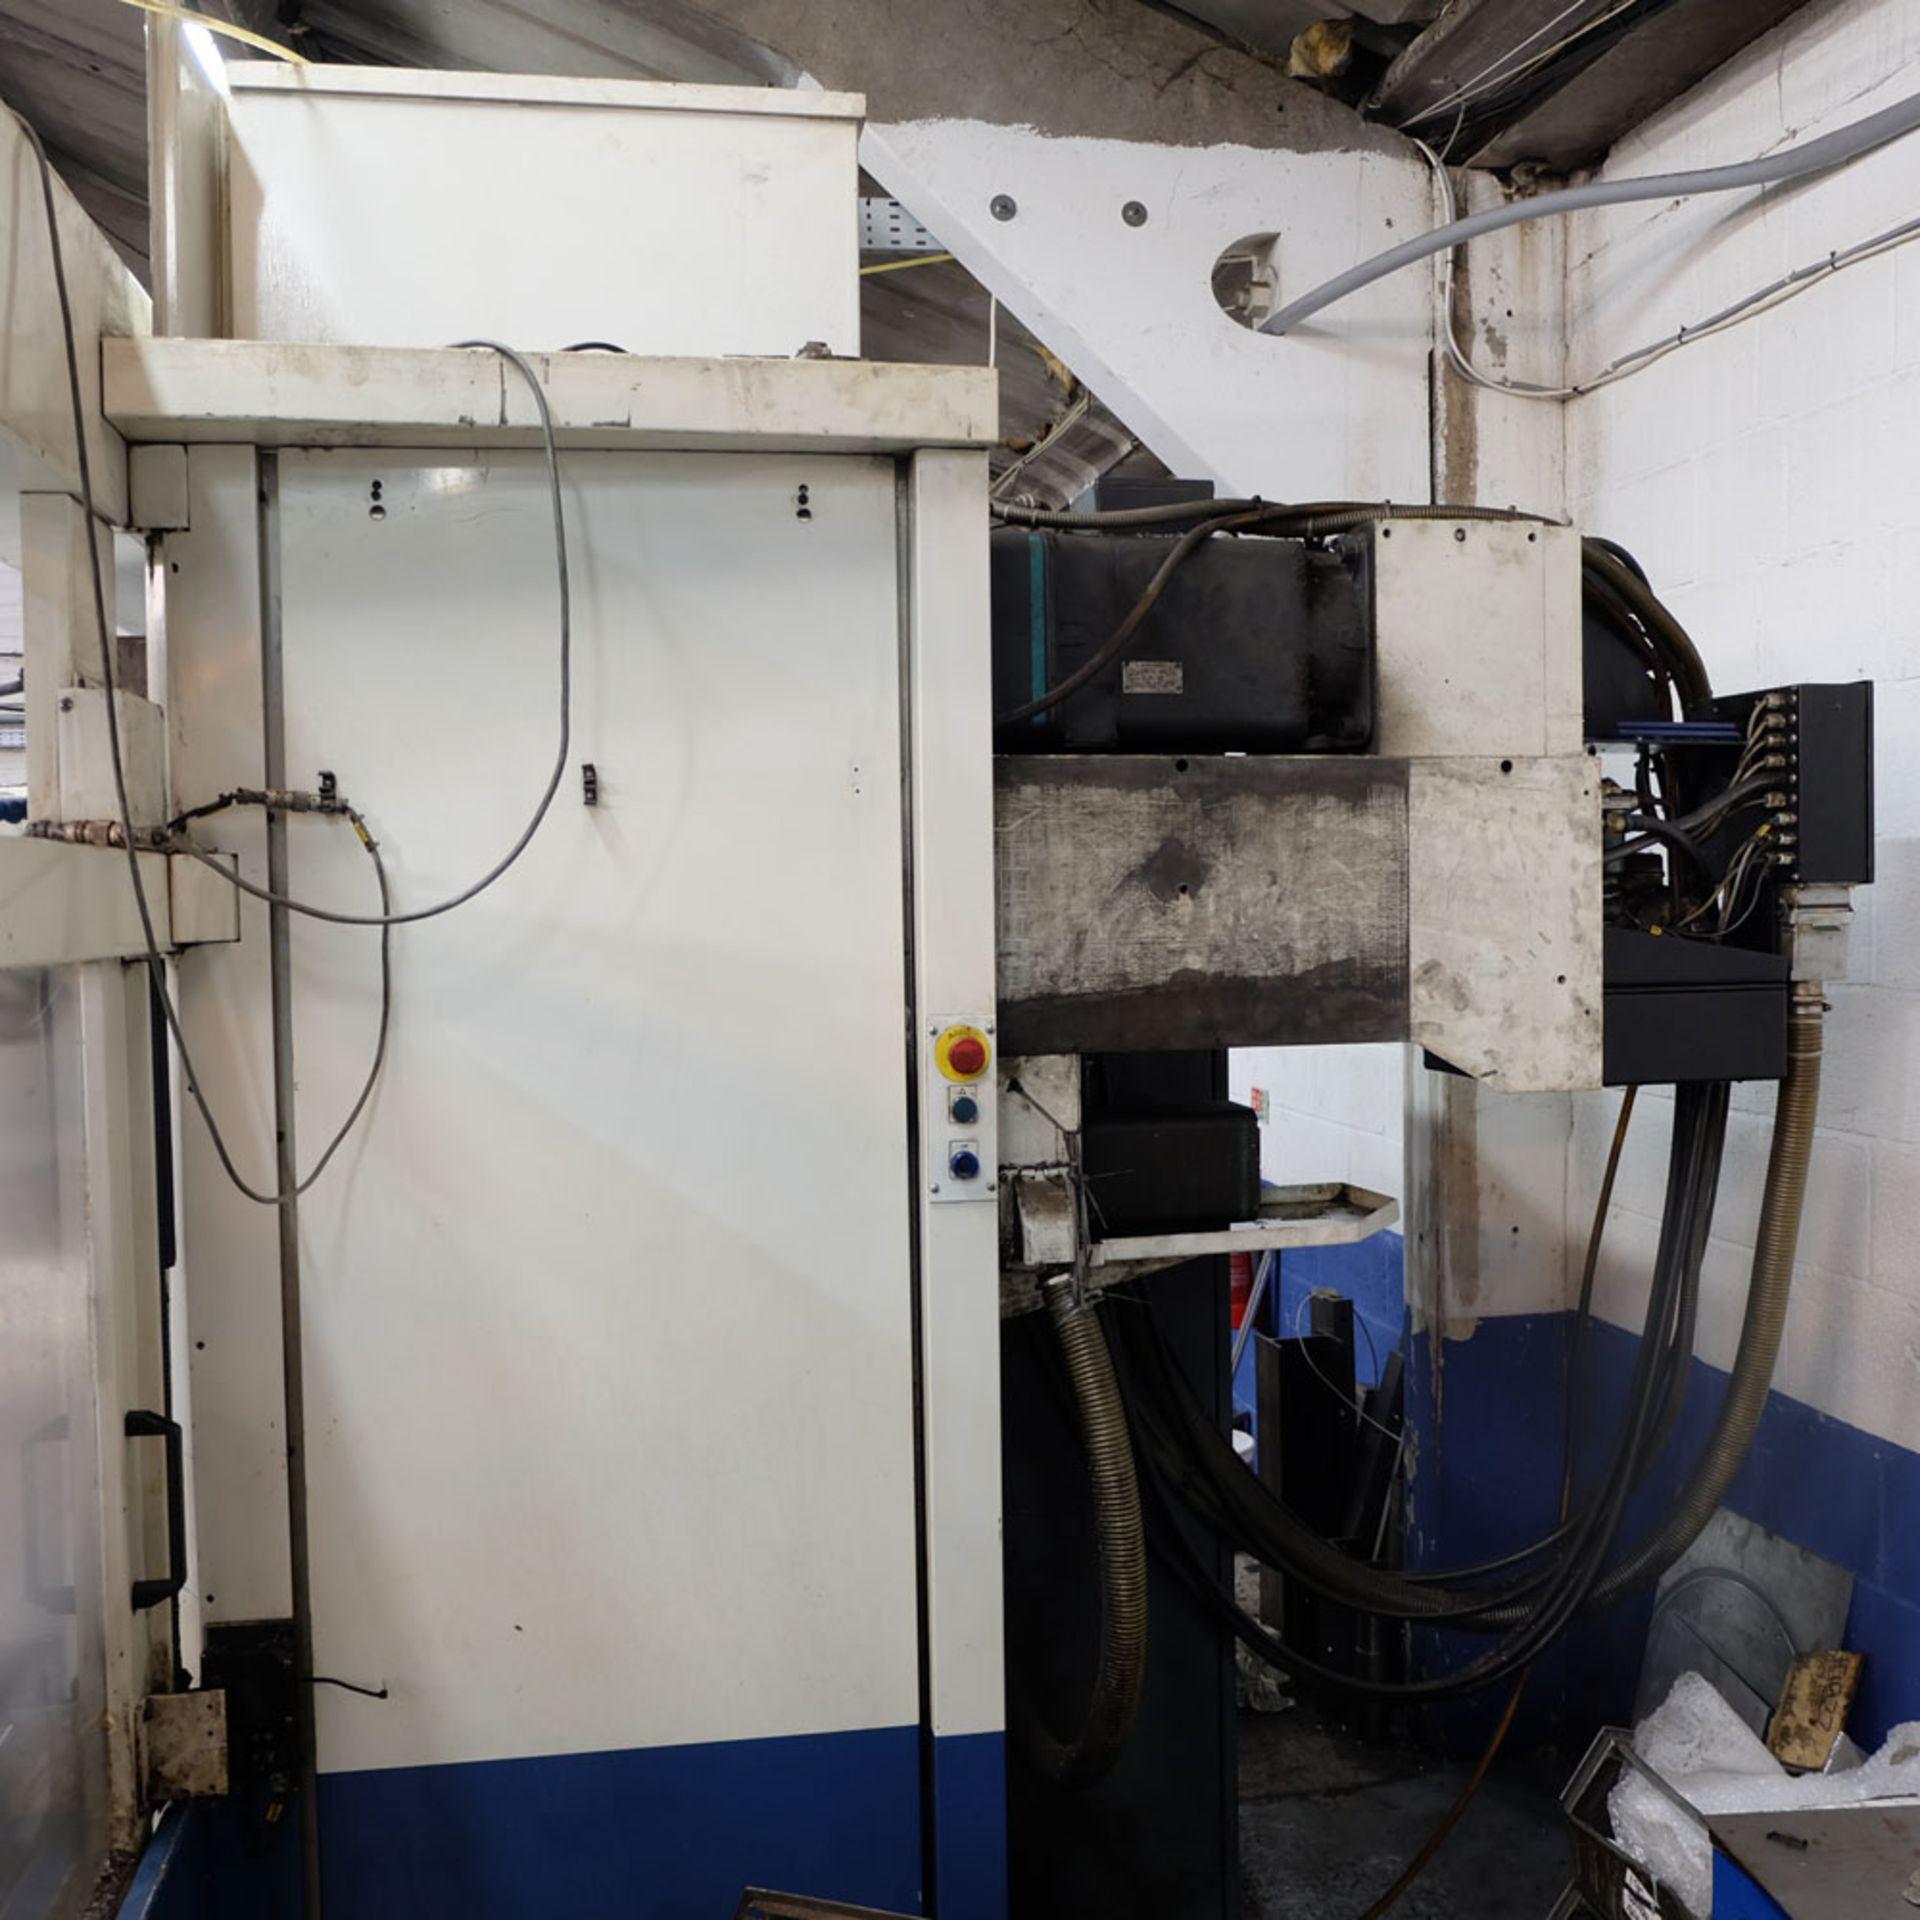 Huron GX 411 F Bed Type Milling Machine. Control Unit: CNC (HEIDENHAIN TNC 415B) - Image 8 of 12